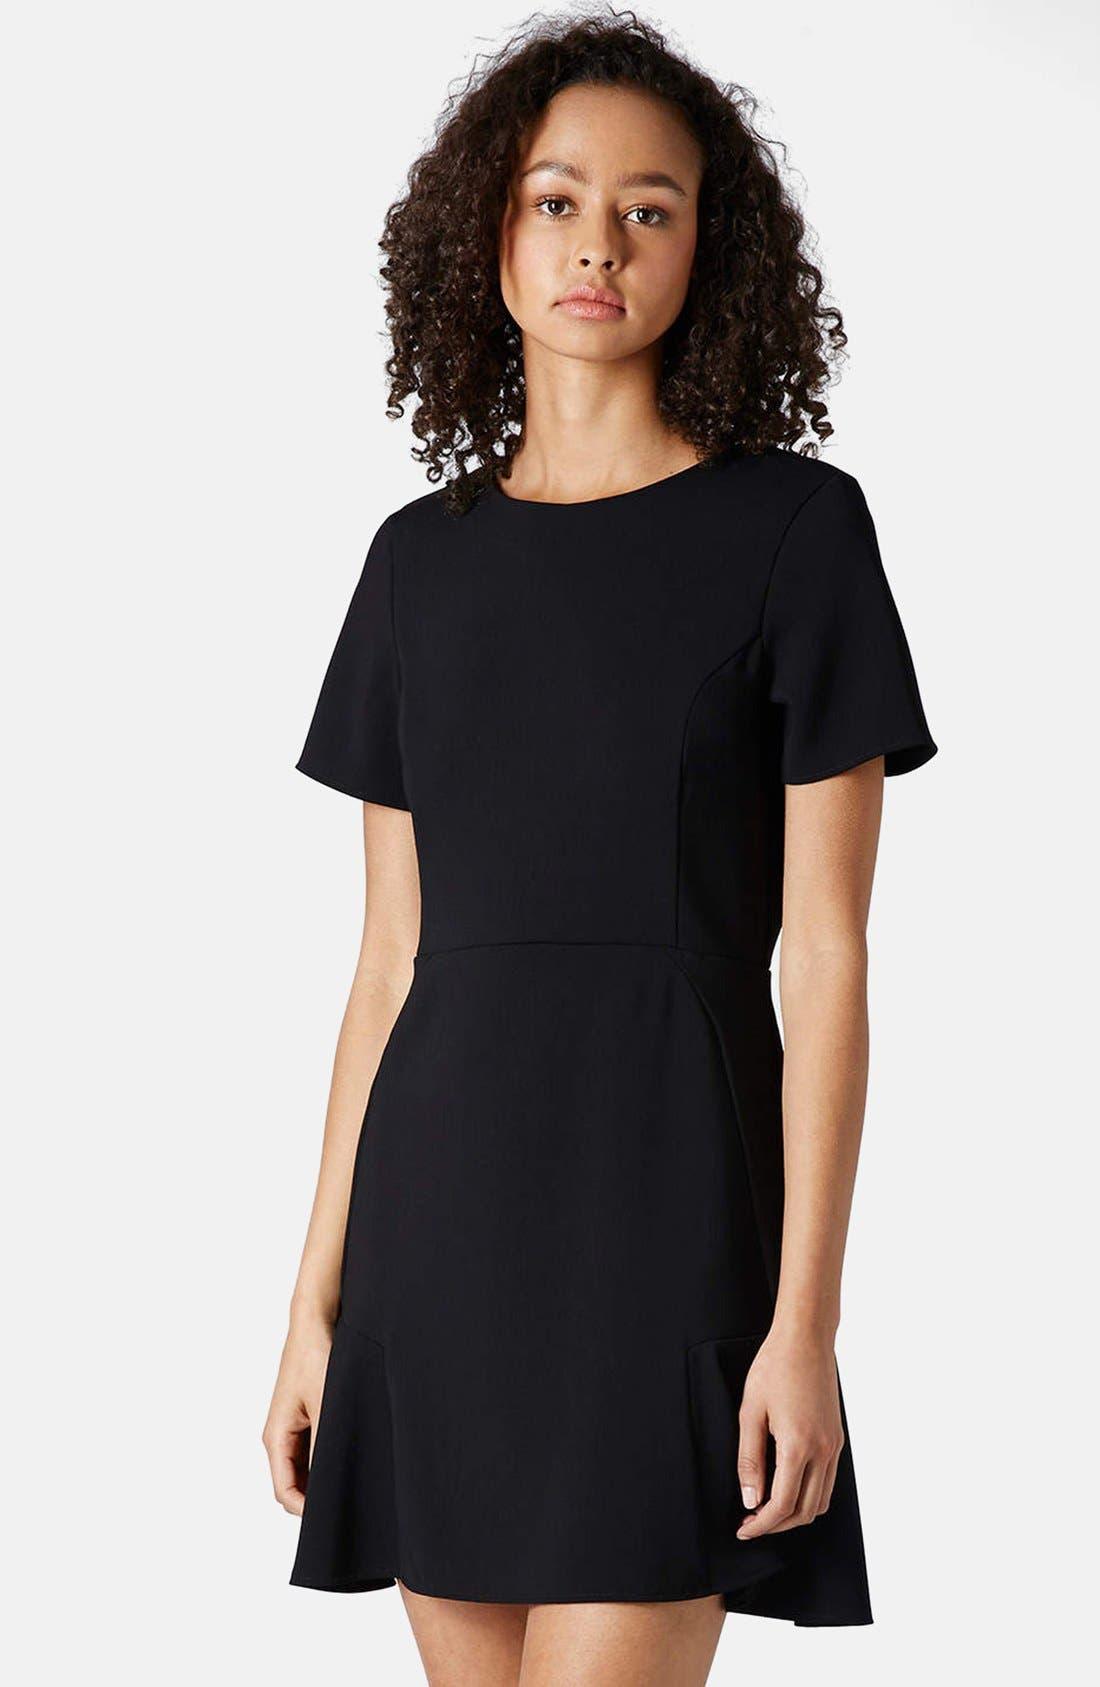 Alternate Image 1 Selected - Topshop Flared Crepe Dress